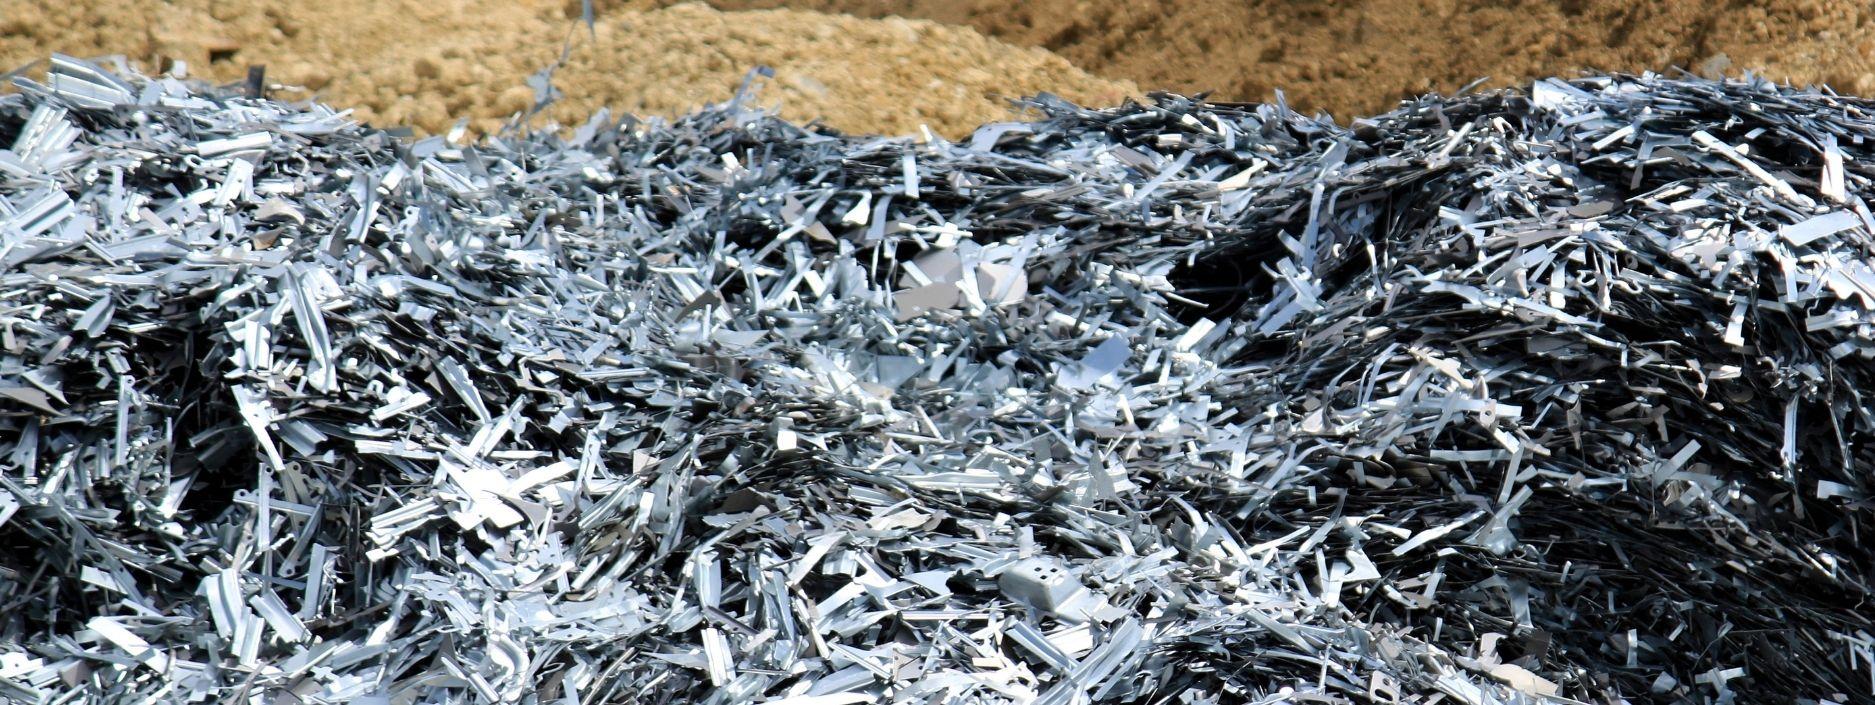 Recycling metal